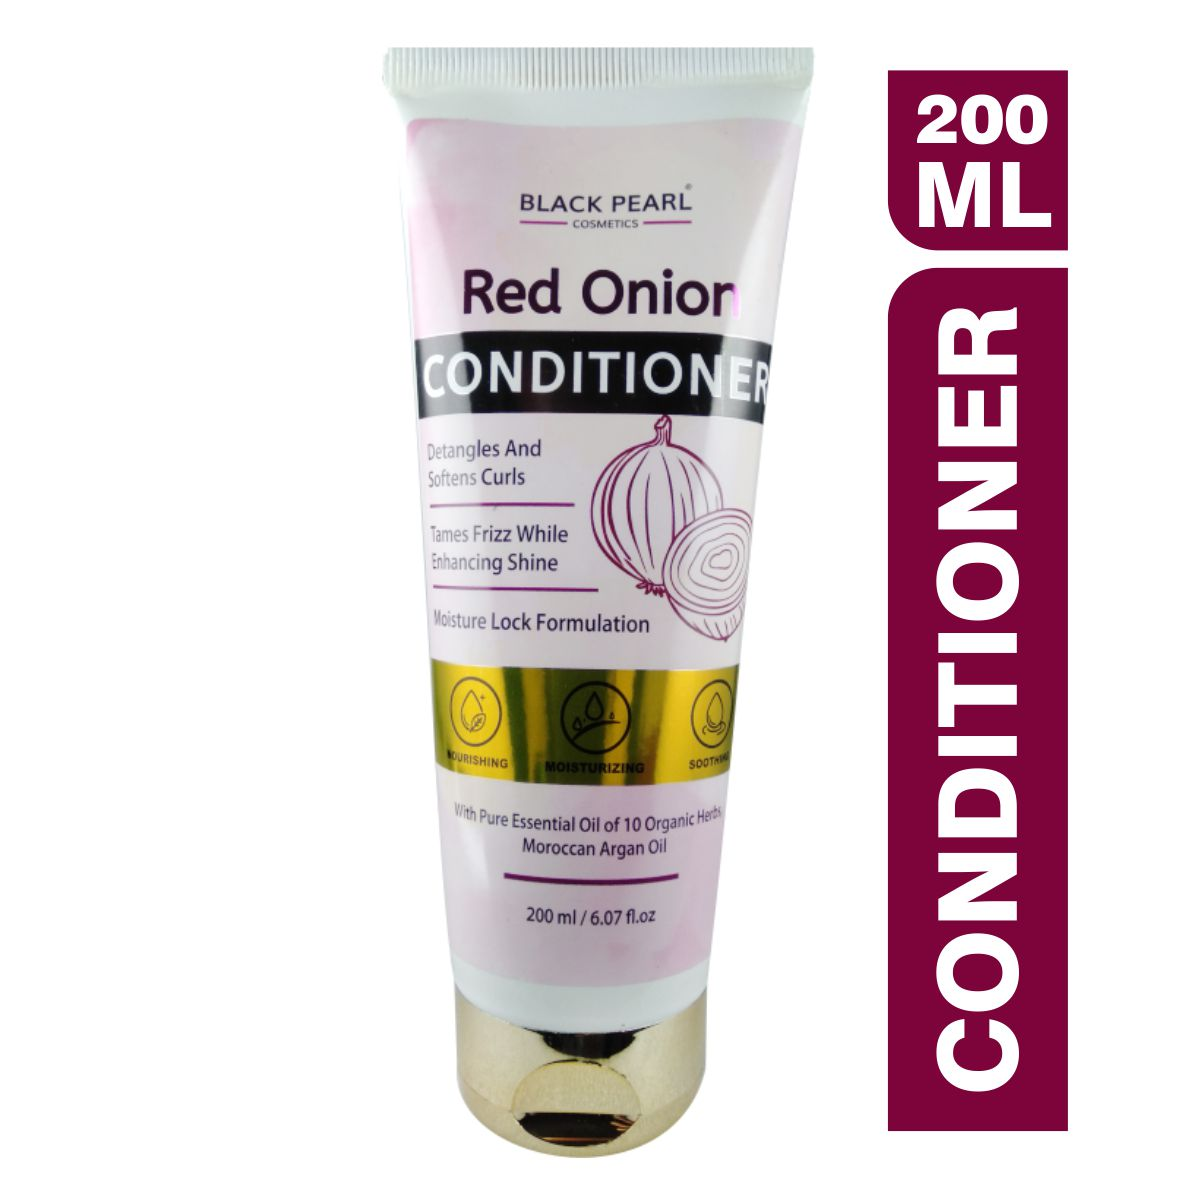 Black Pearl Red Onion Conditioner